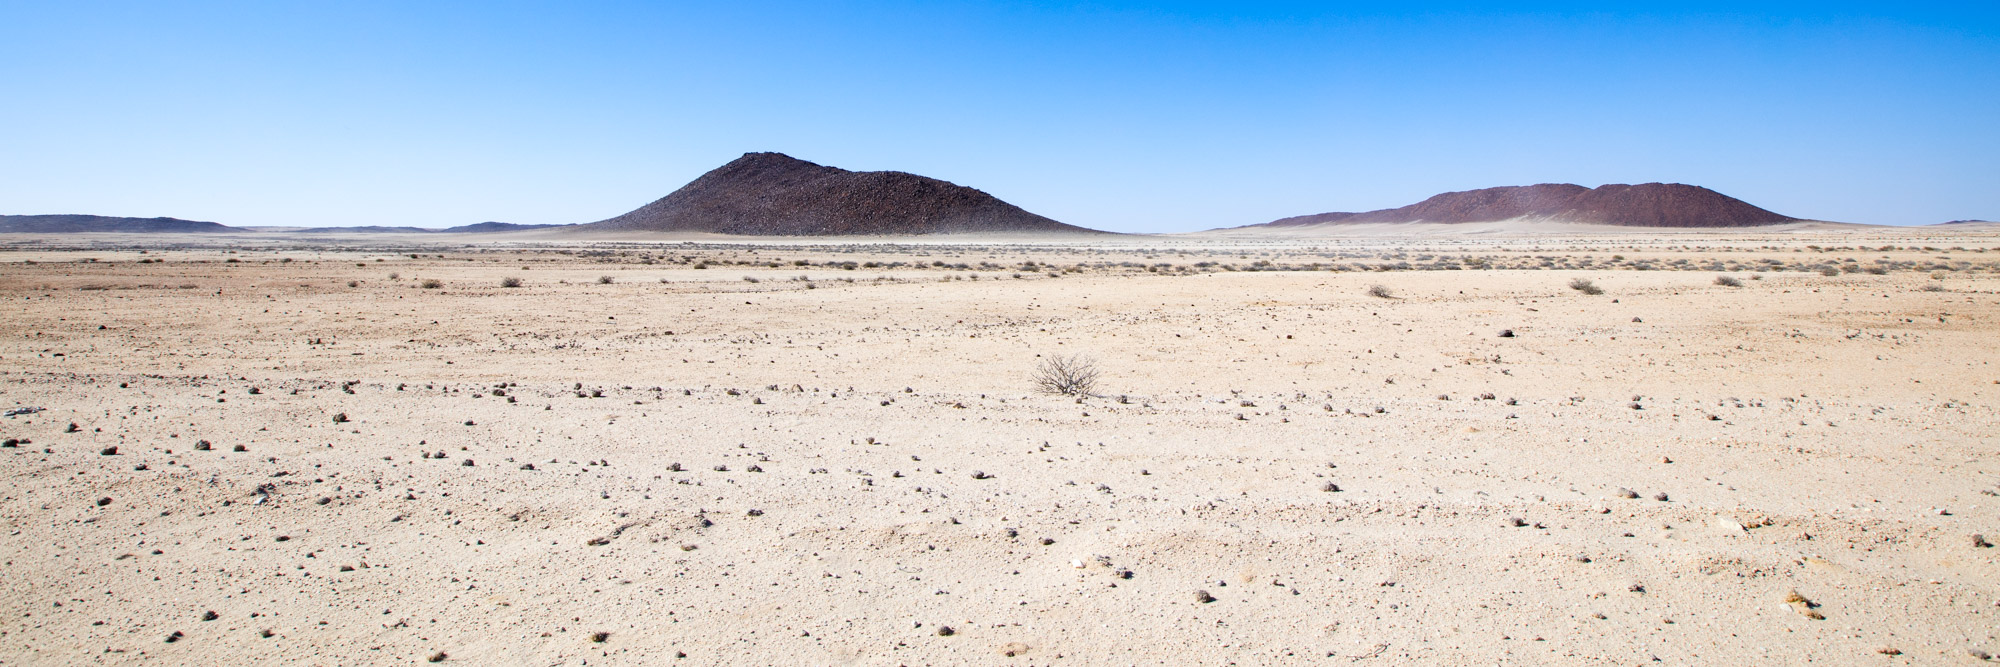 Namibia Plains II